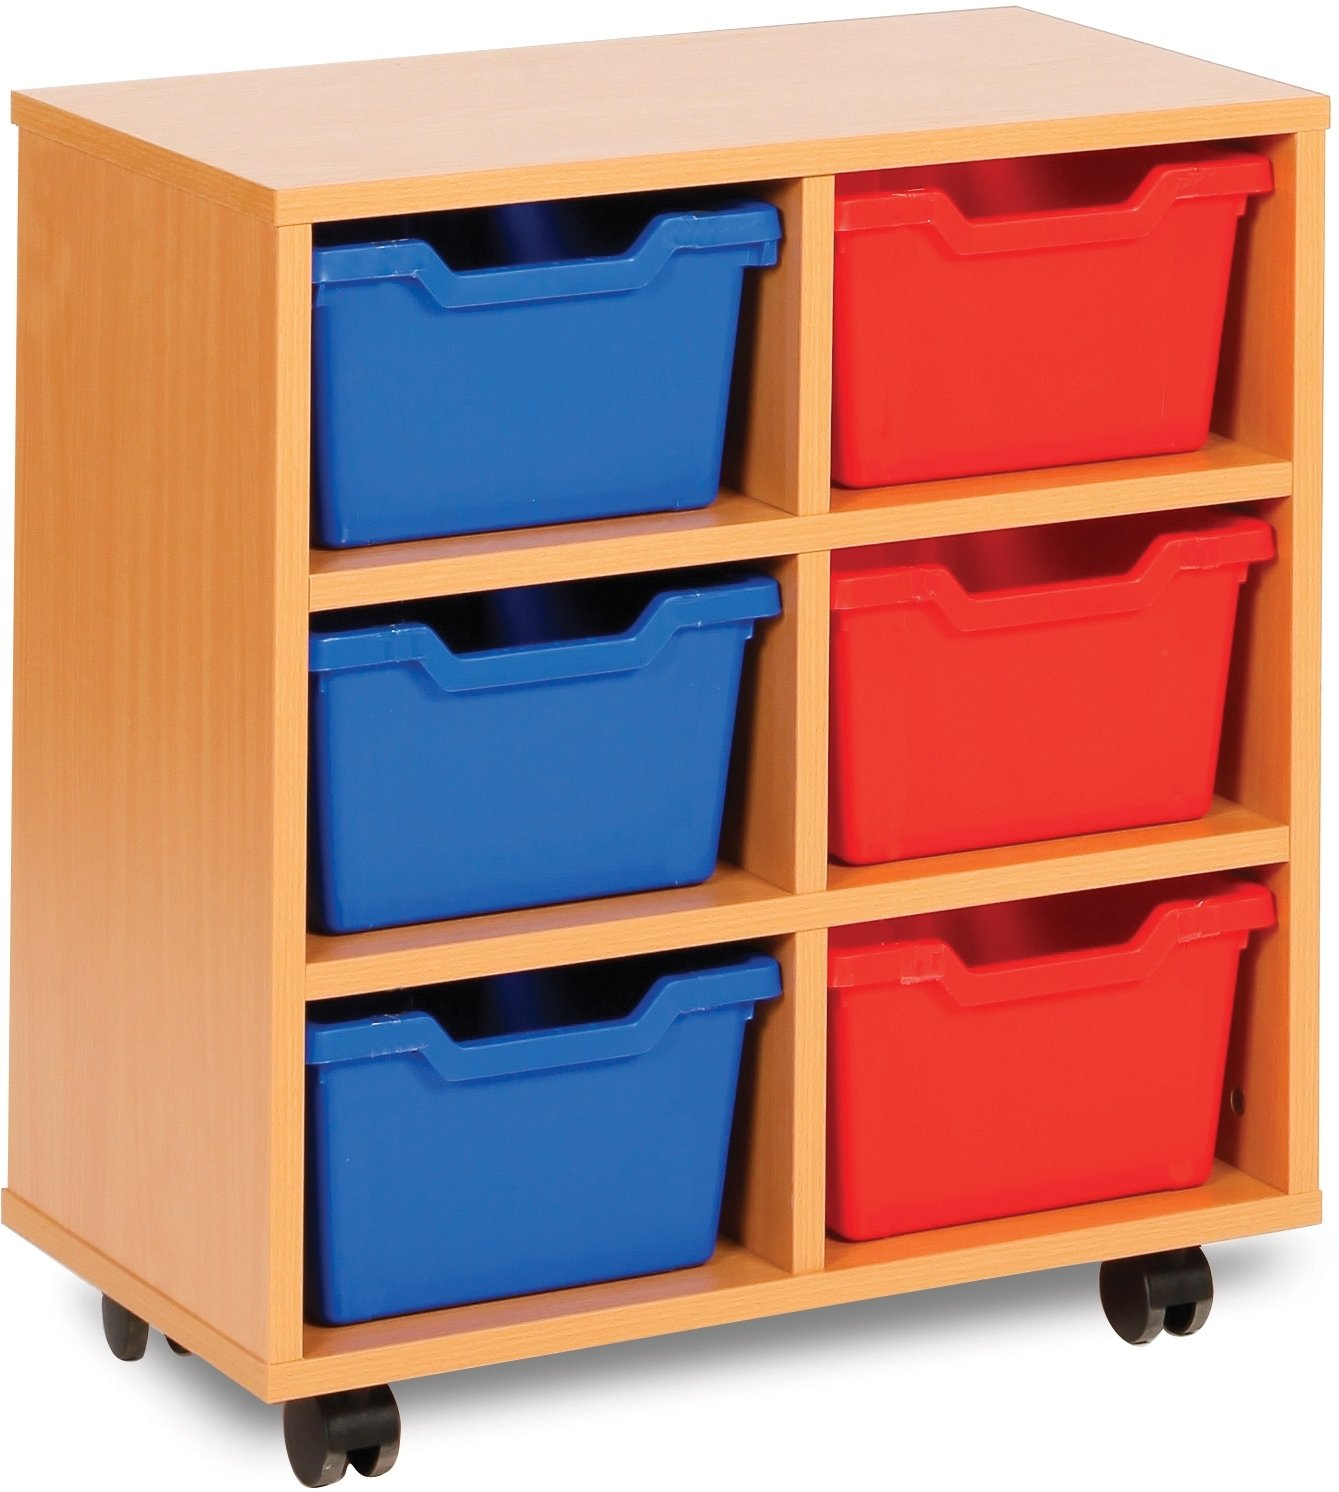 Cubby Tray Storage 2 Bay 6 Tray Units